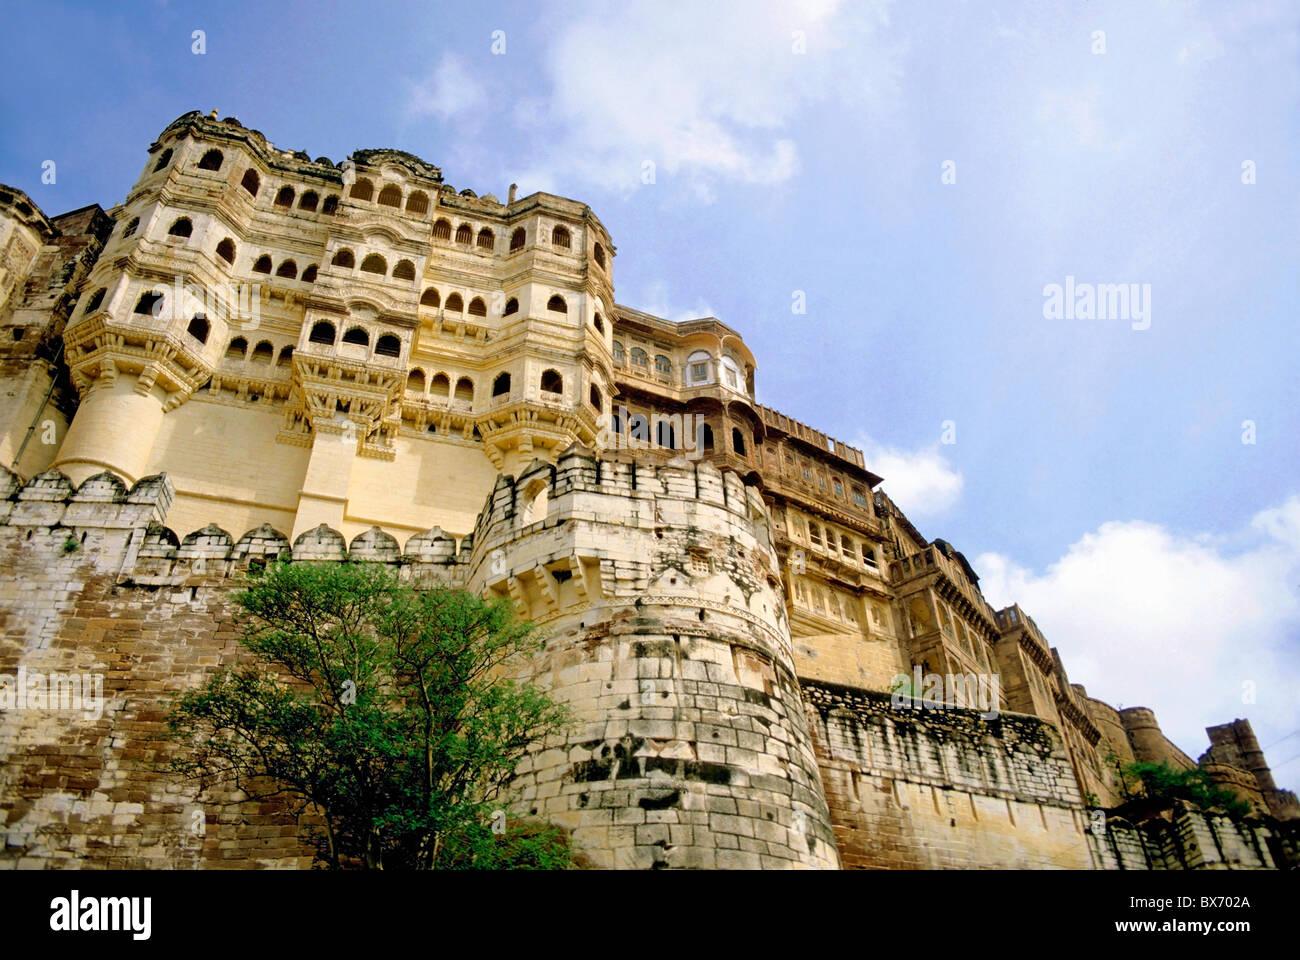 Forte Mehrangarh, Jodhpur, Rajasthan, India. Immagini Stock